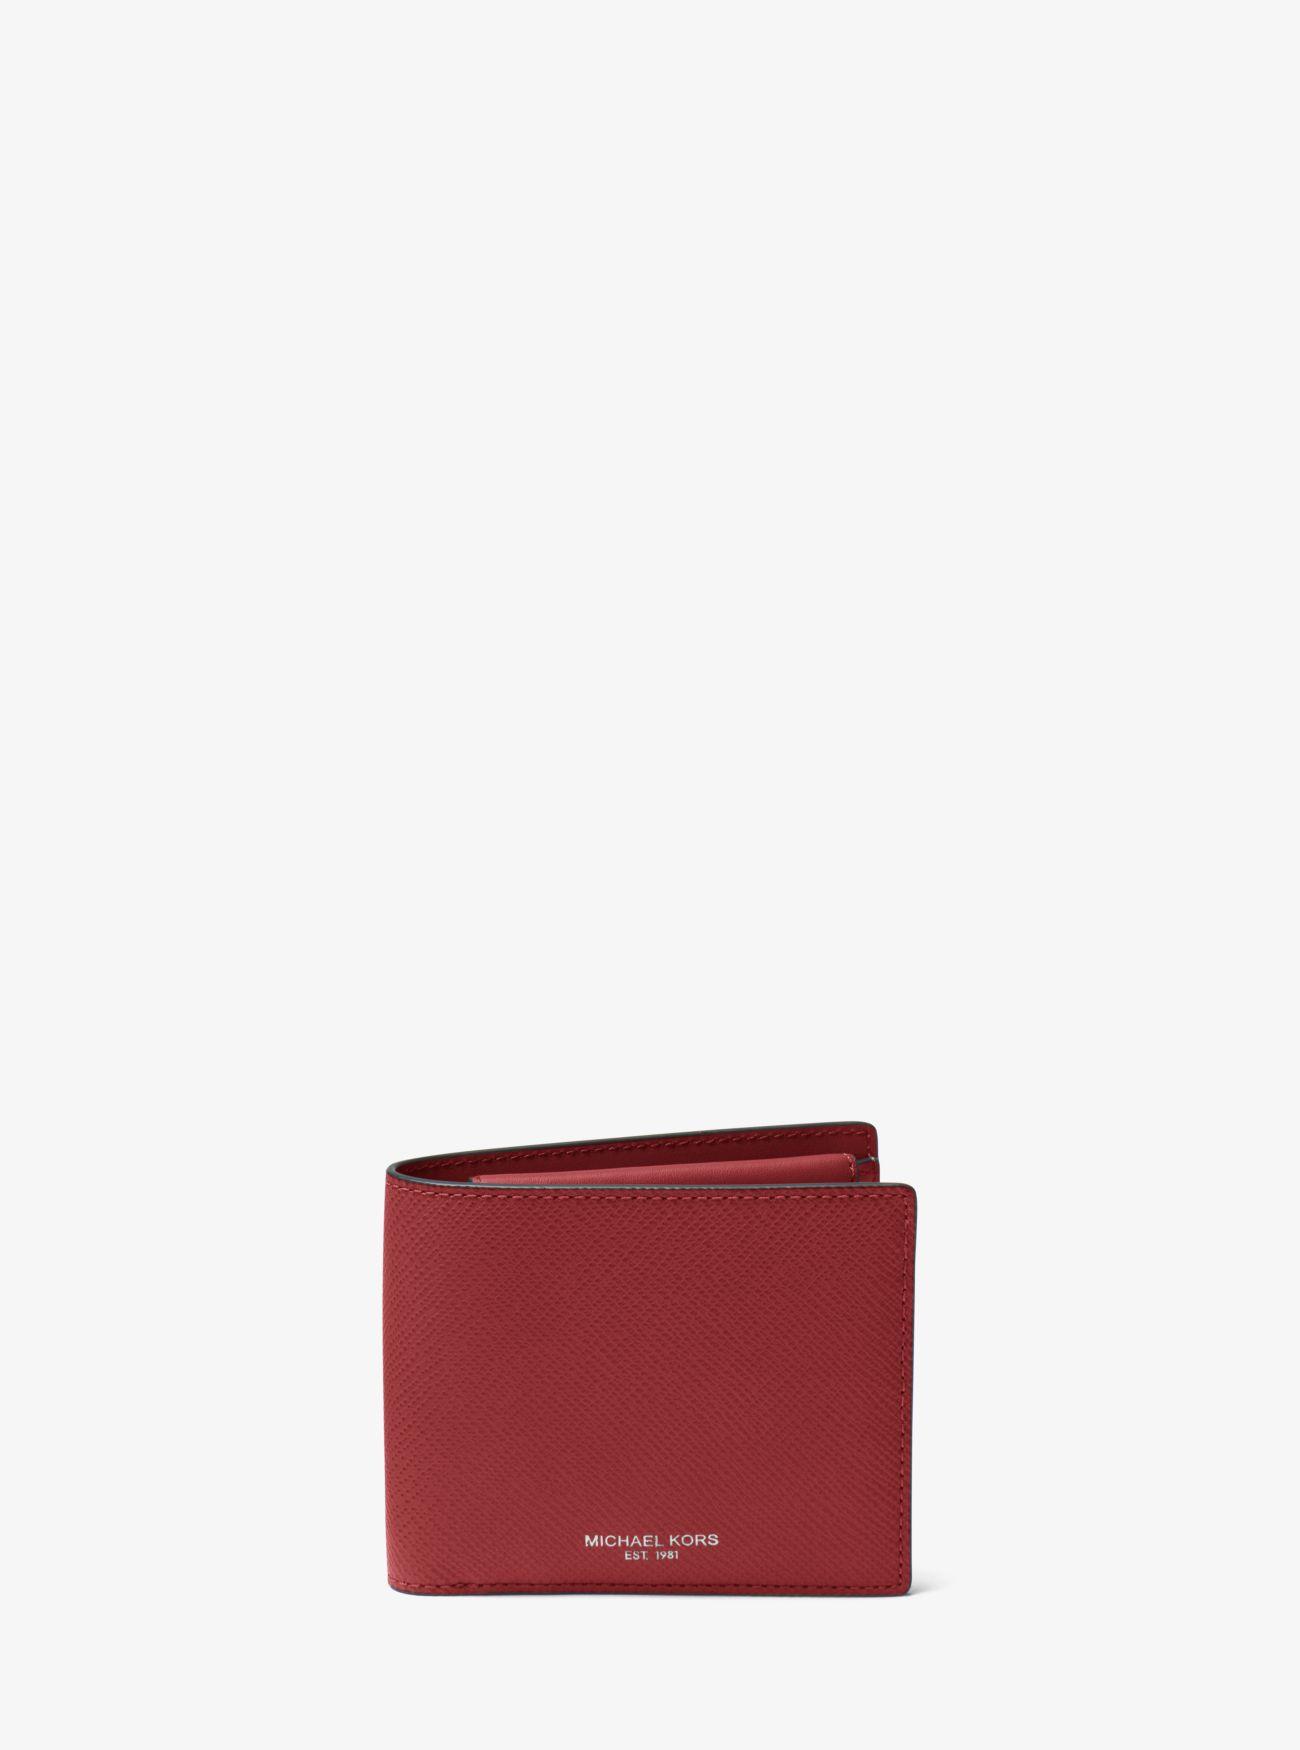 6cf5ca0c0b18 Harrison Crossgrain Leather Billfold Wallet With Coin Pocket Harrison  Crossgrain Leather Billfold Wallet With Coin Pocket. Michael Kors Mens